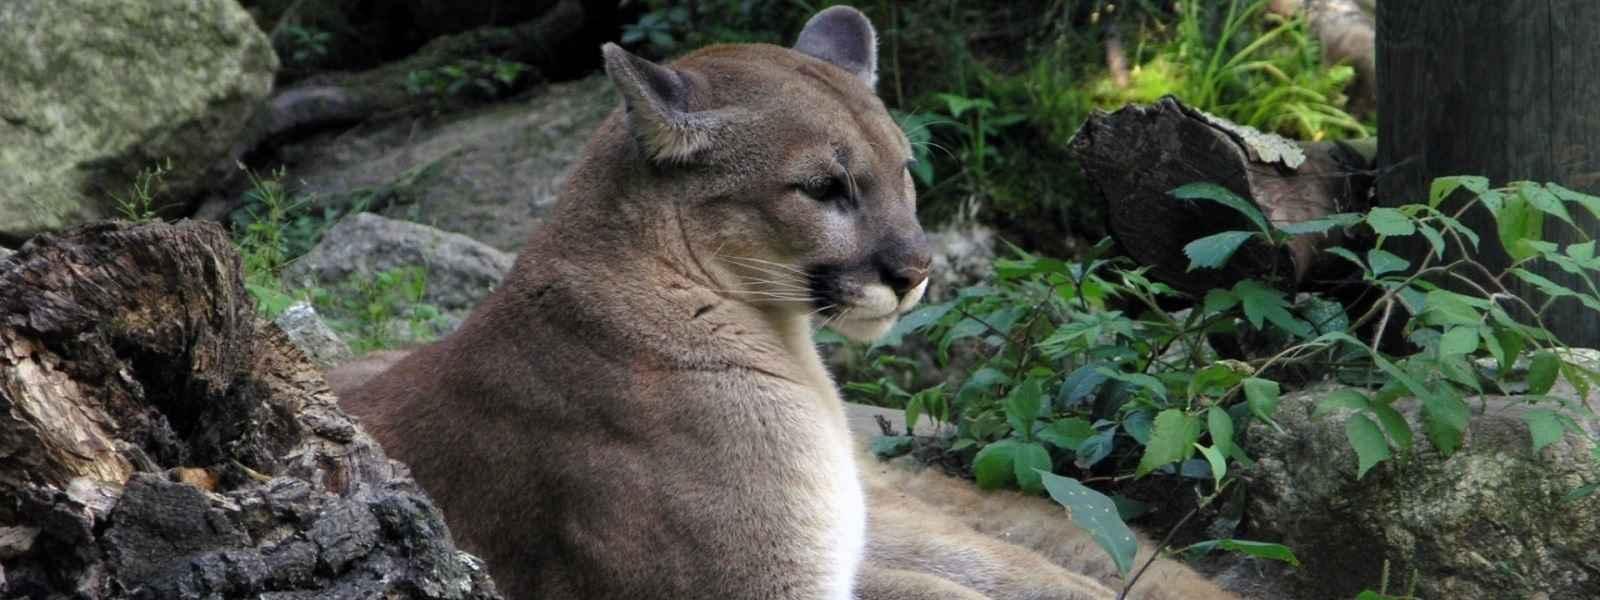 Help Save America's Lion image